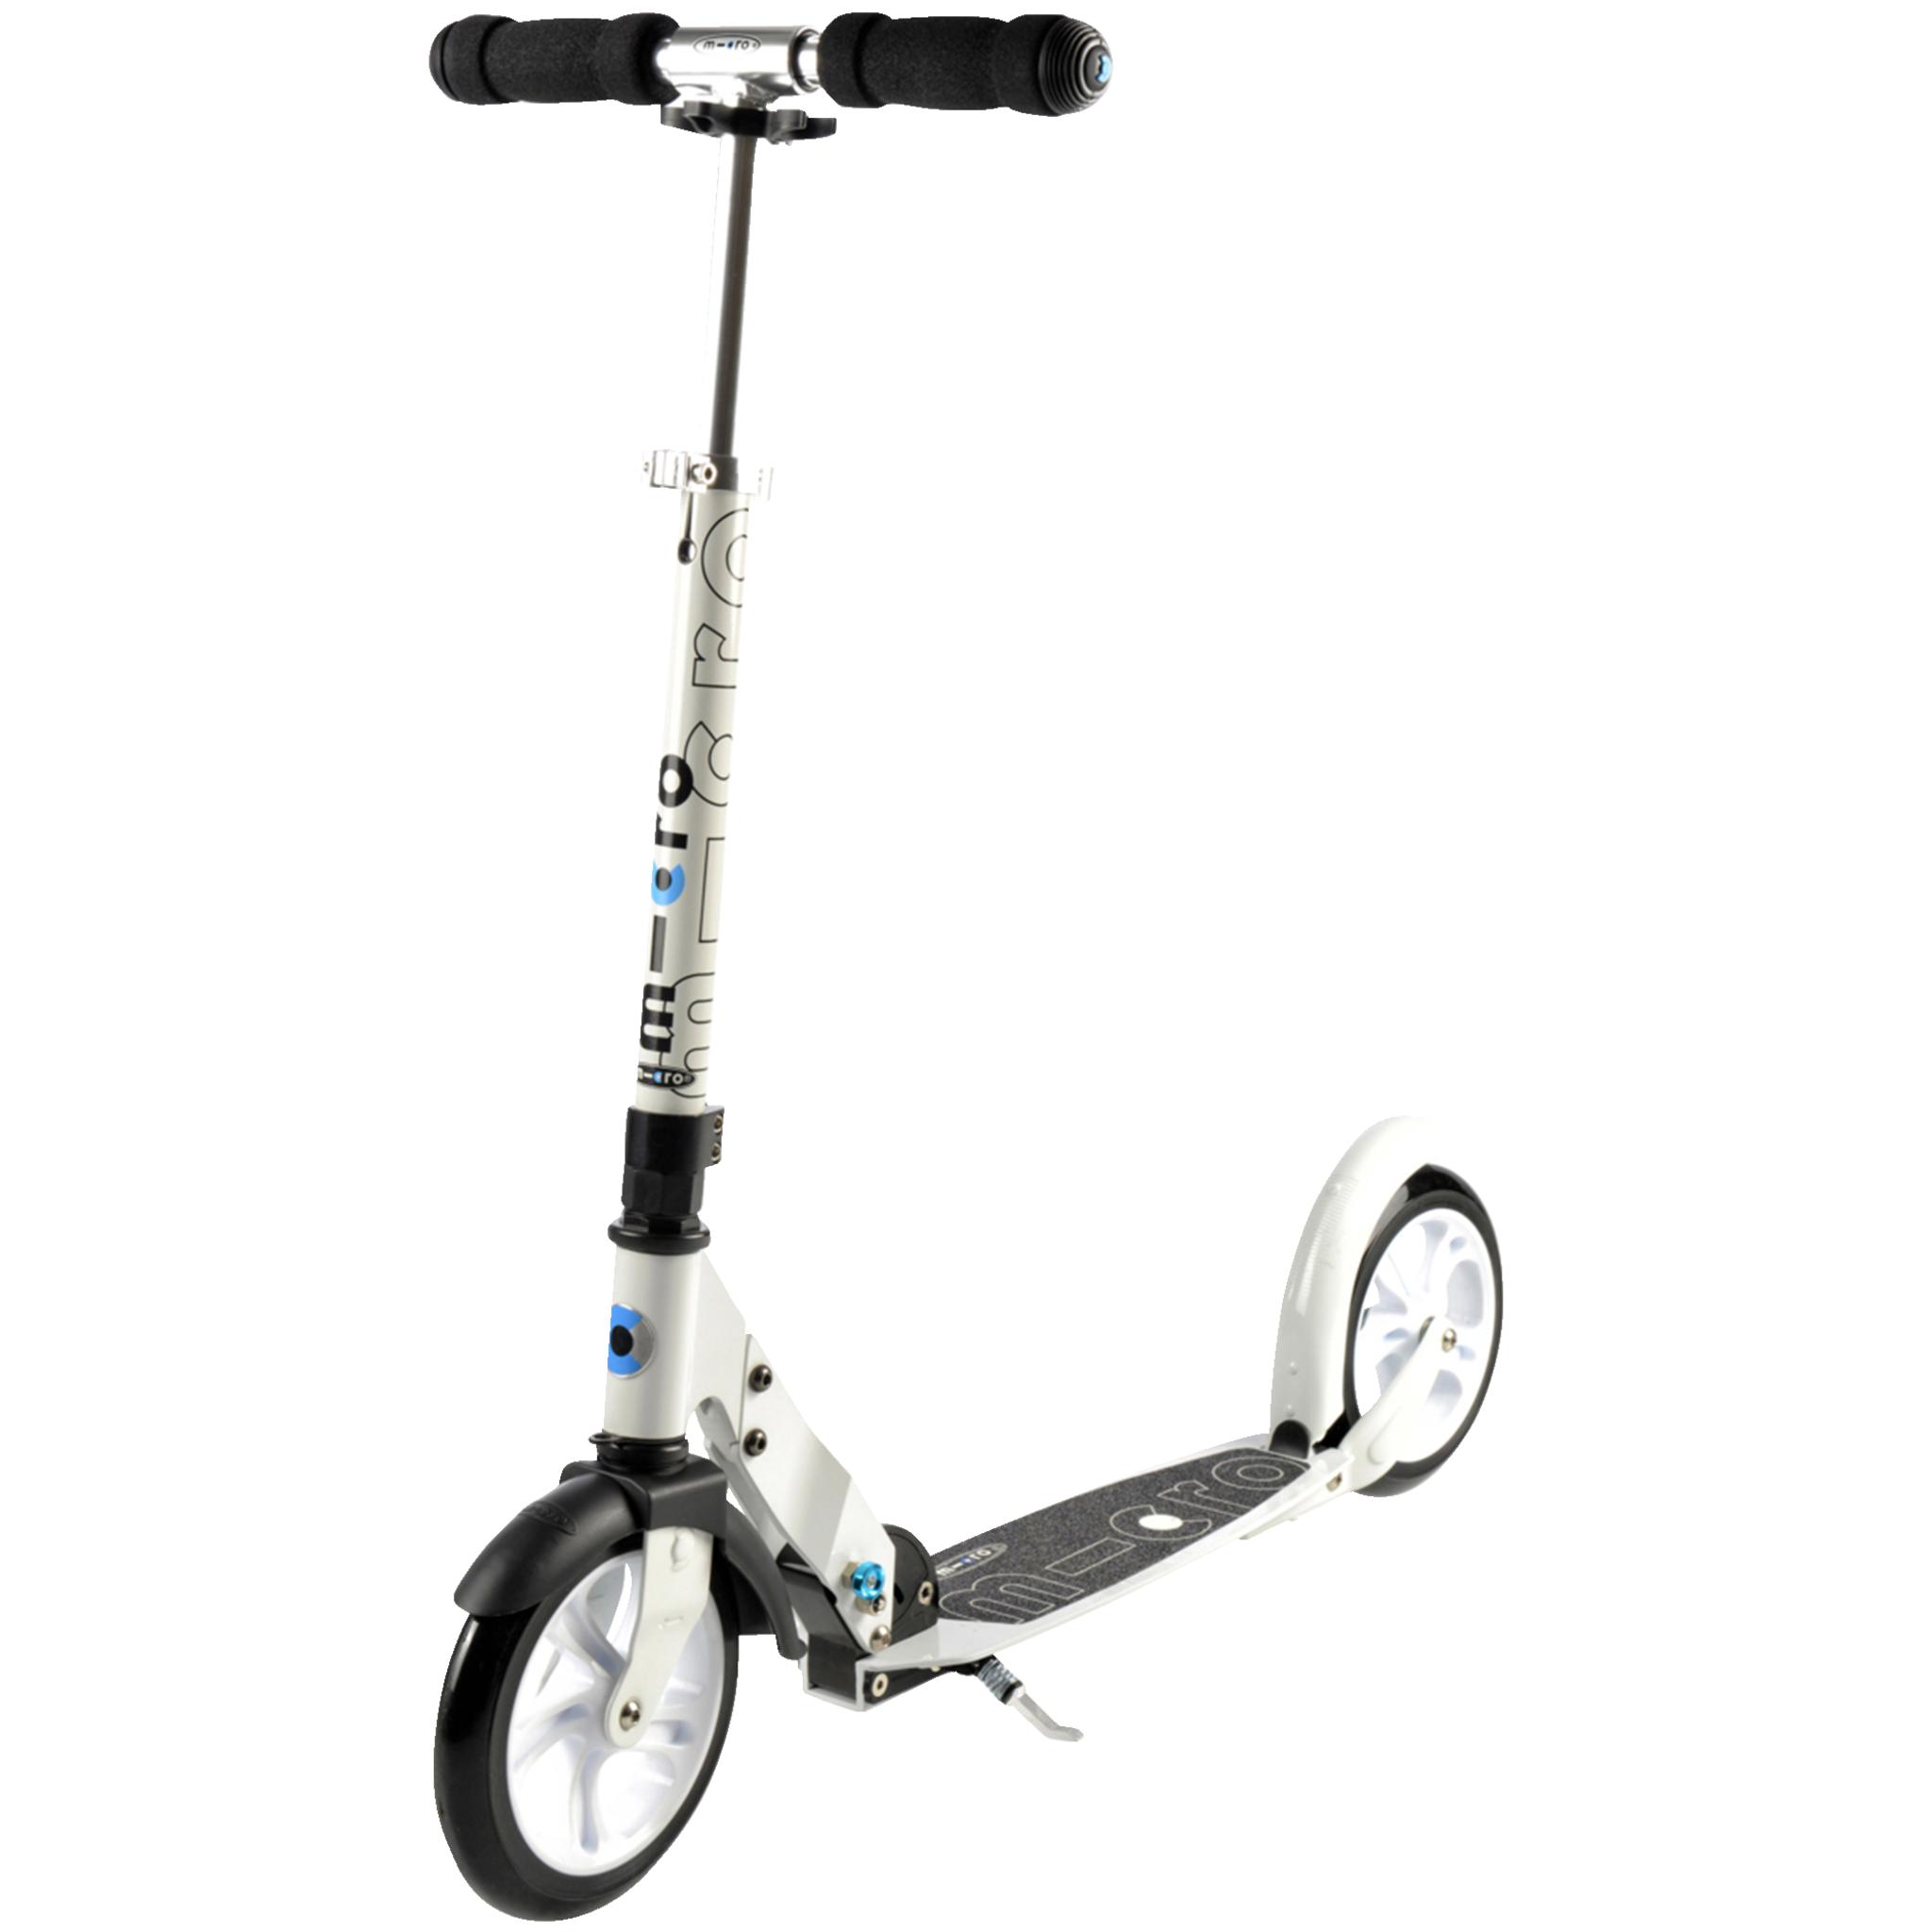 MicroWhite mobilityscooter, sparkesykkel